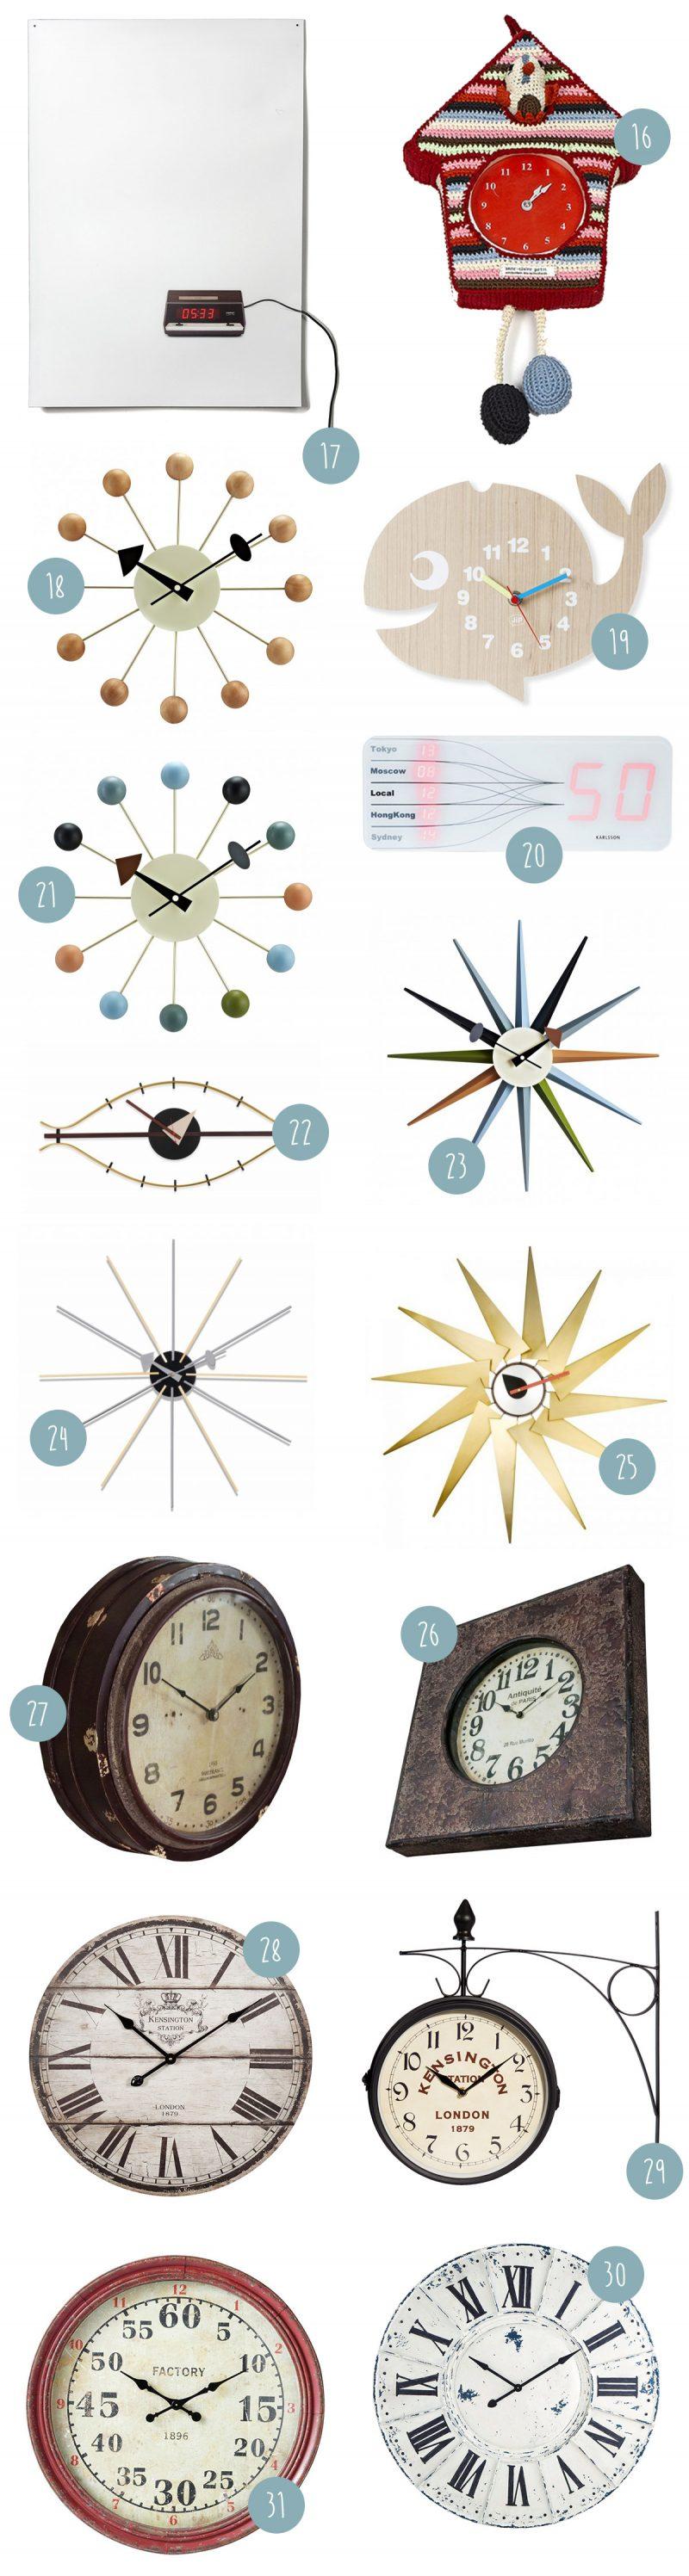 35 id es d co d 39 horloge murale. Black Bedroom Furniture Sets. Home Design Ideas